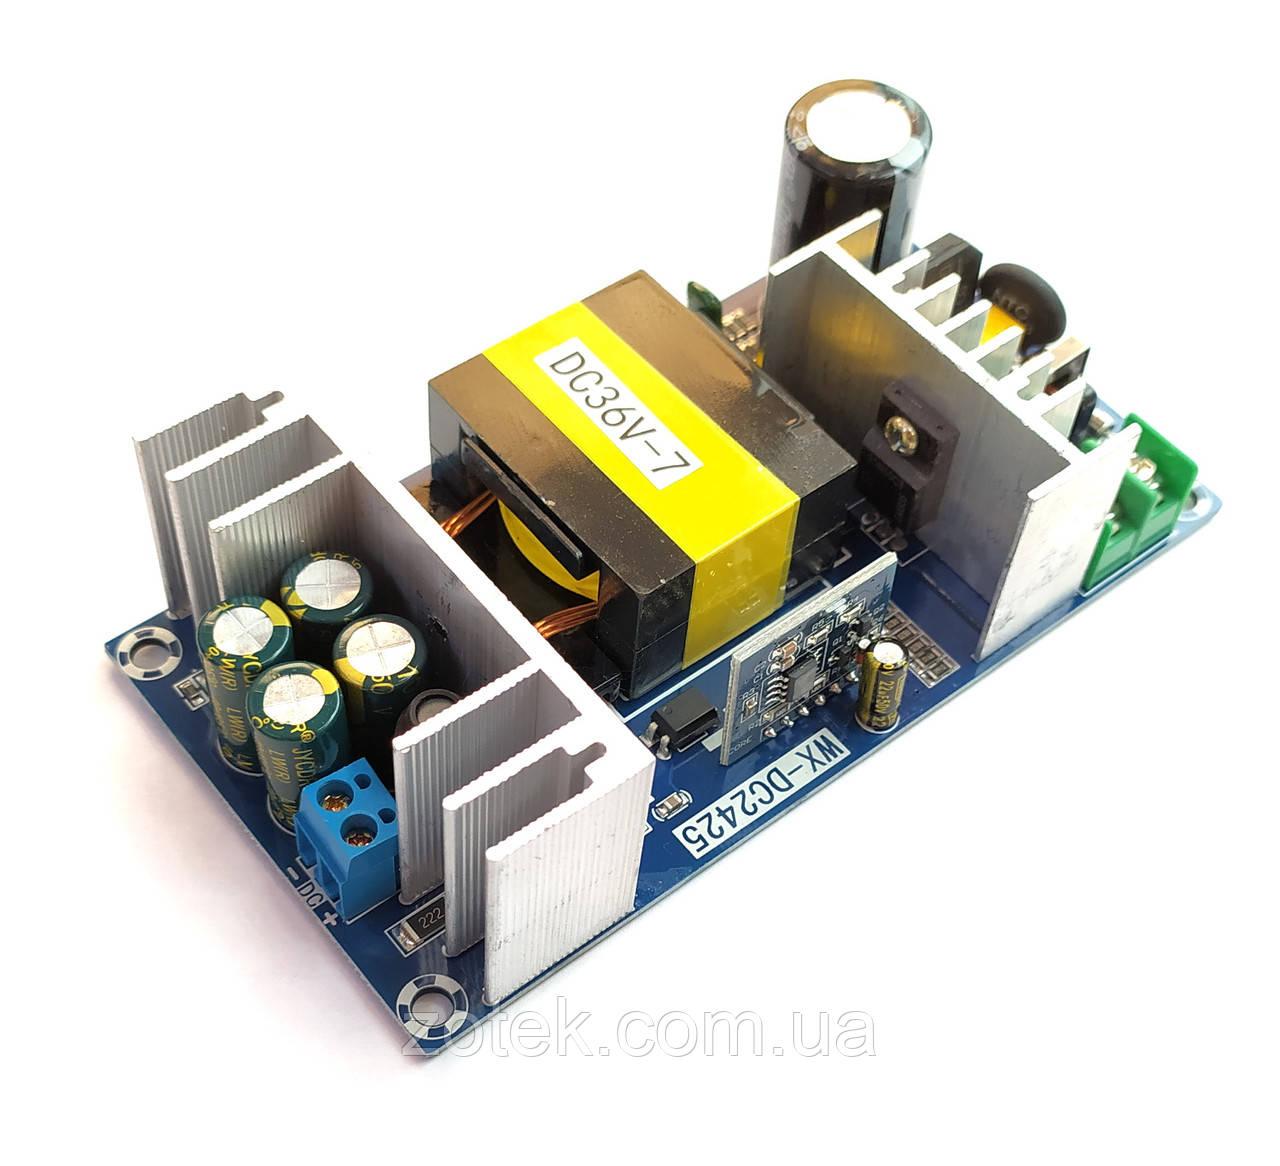 Microchip 36В 7А 9А 250 Вт Импульсный блок питания AC-DC 36V 7A 250W WX-DC2425-36